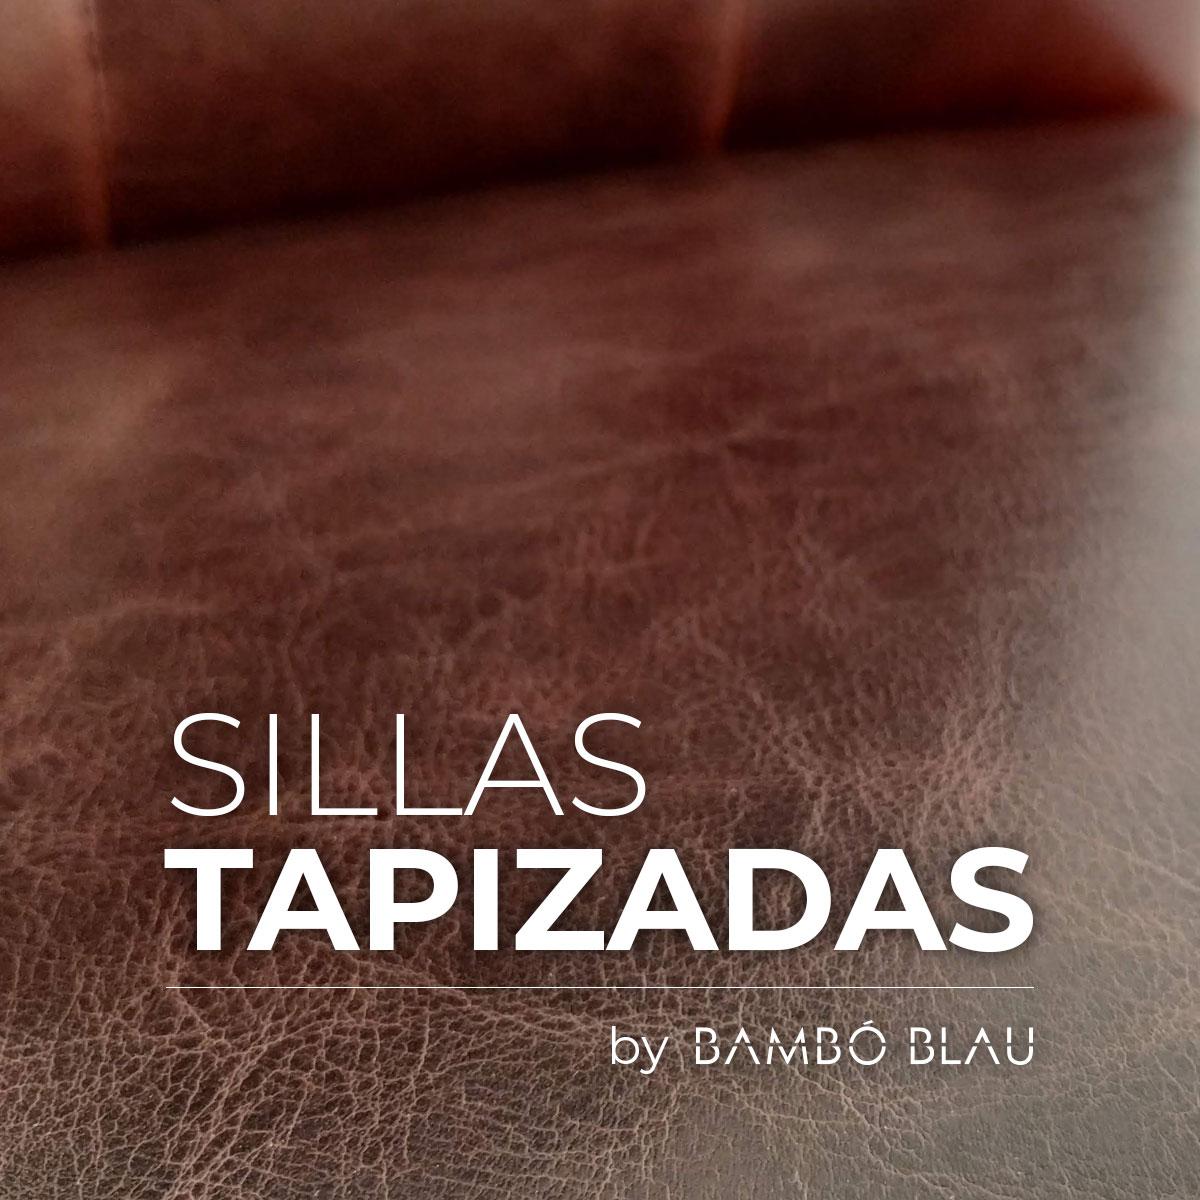 Sillas tapizadas by Bambó Blau